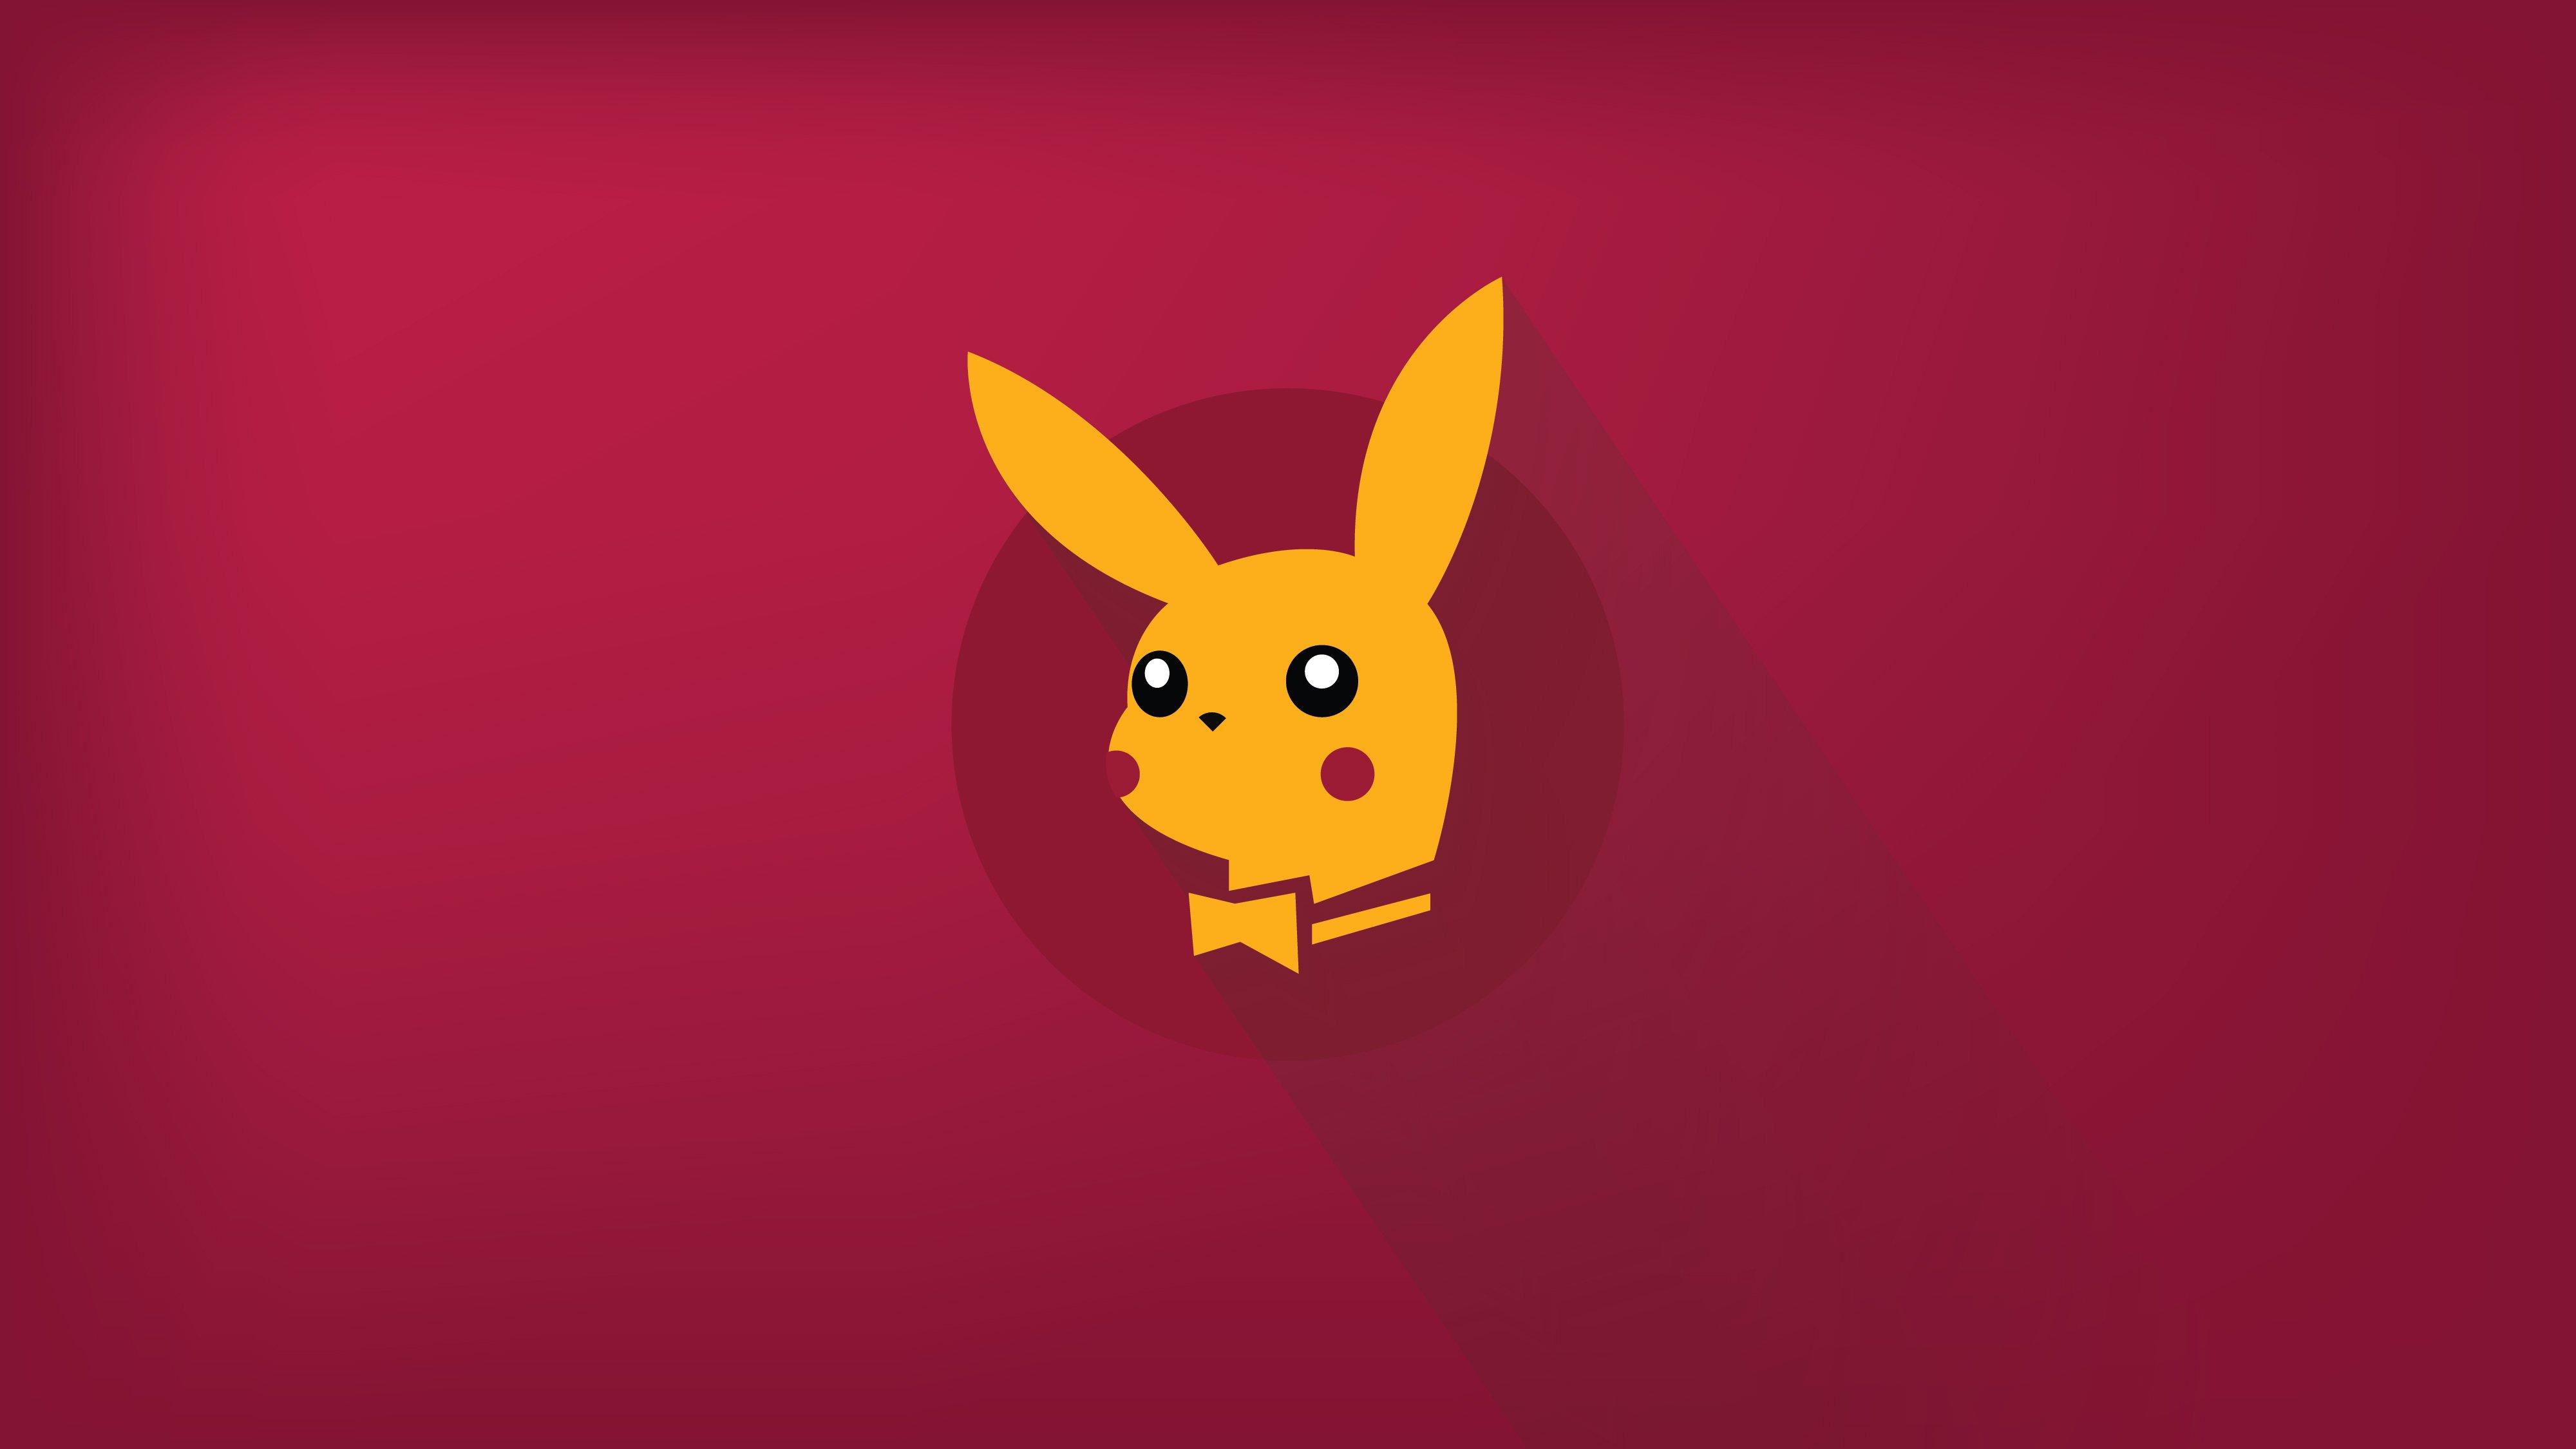 Fondos de pantalla Pikachu